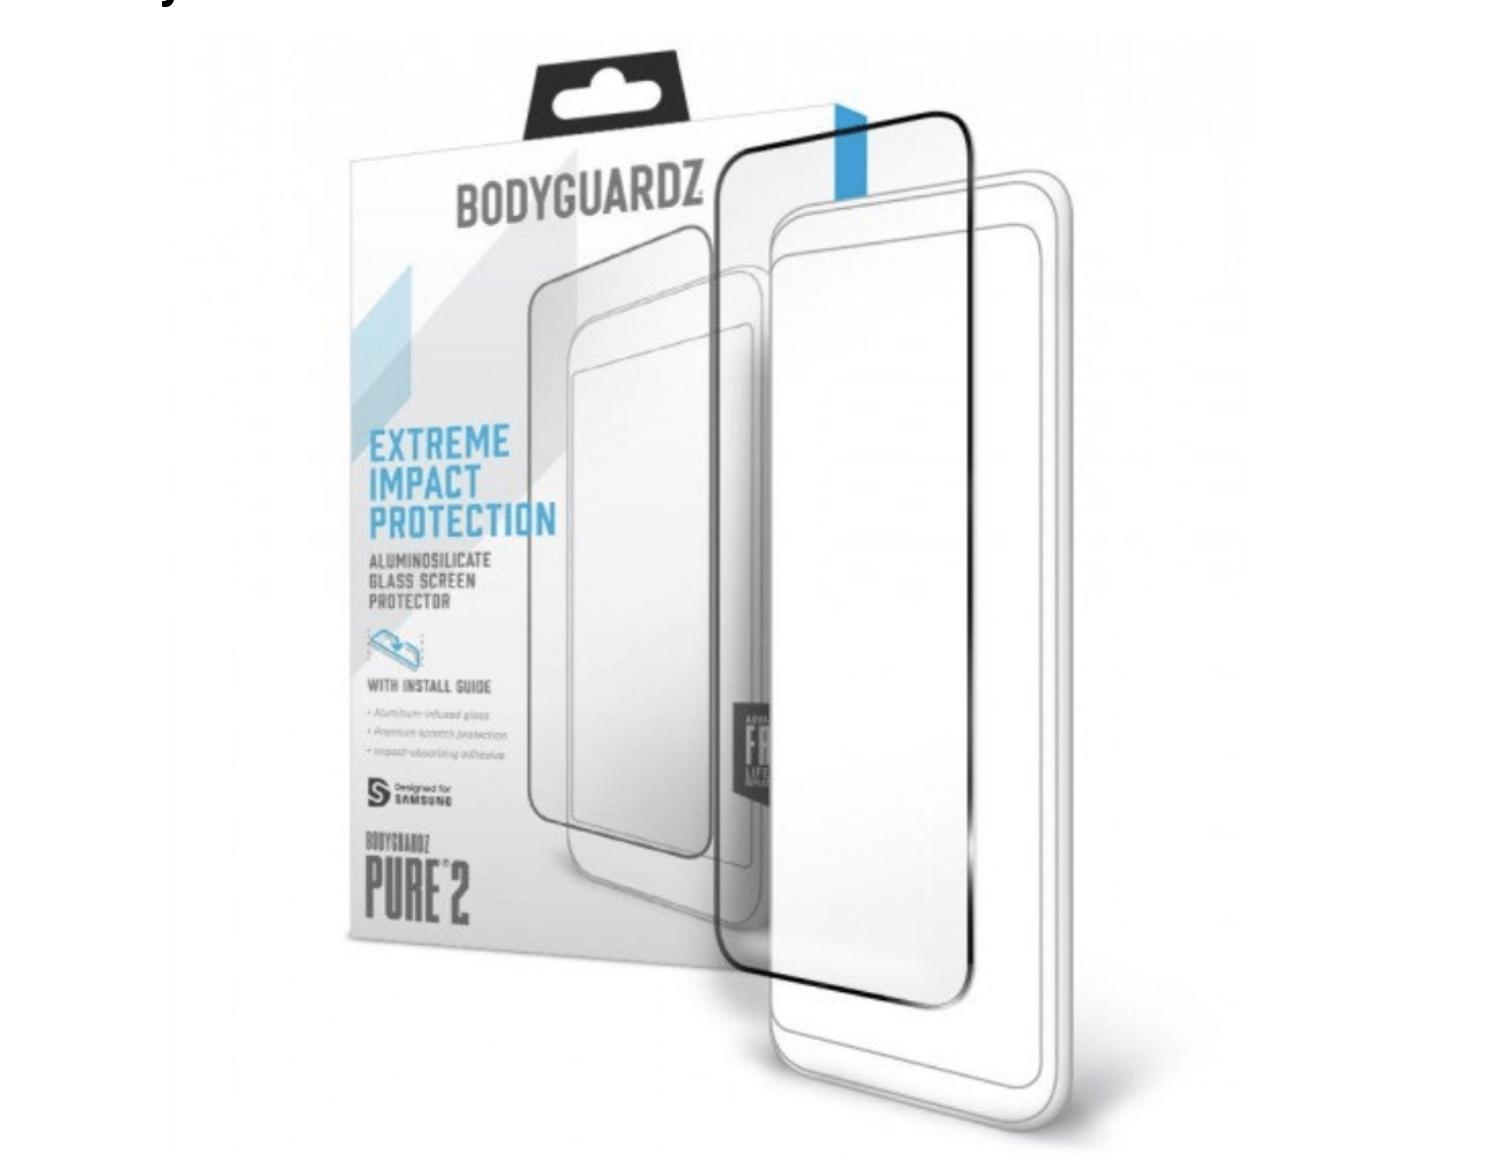 Galaxy S10+ Ace Pro Case